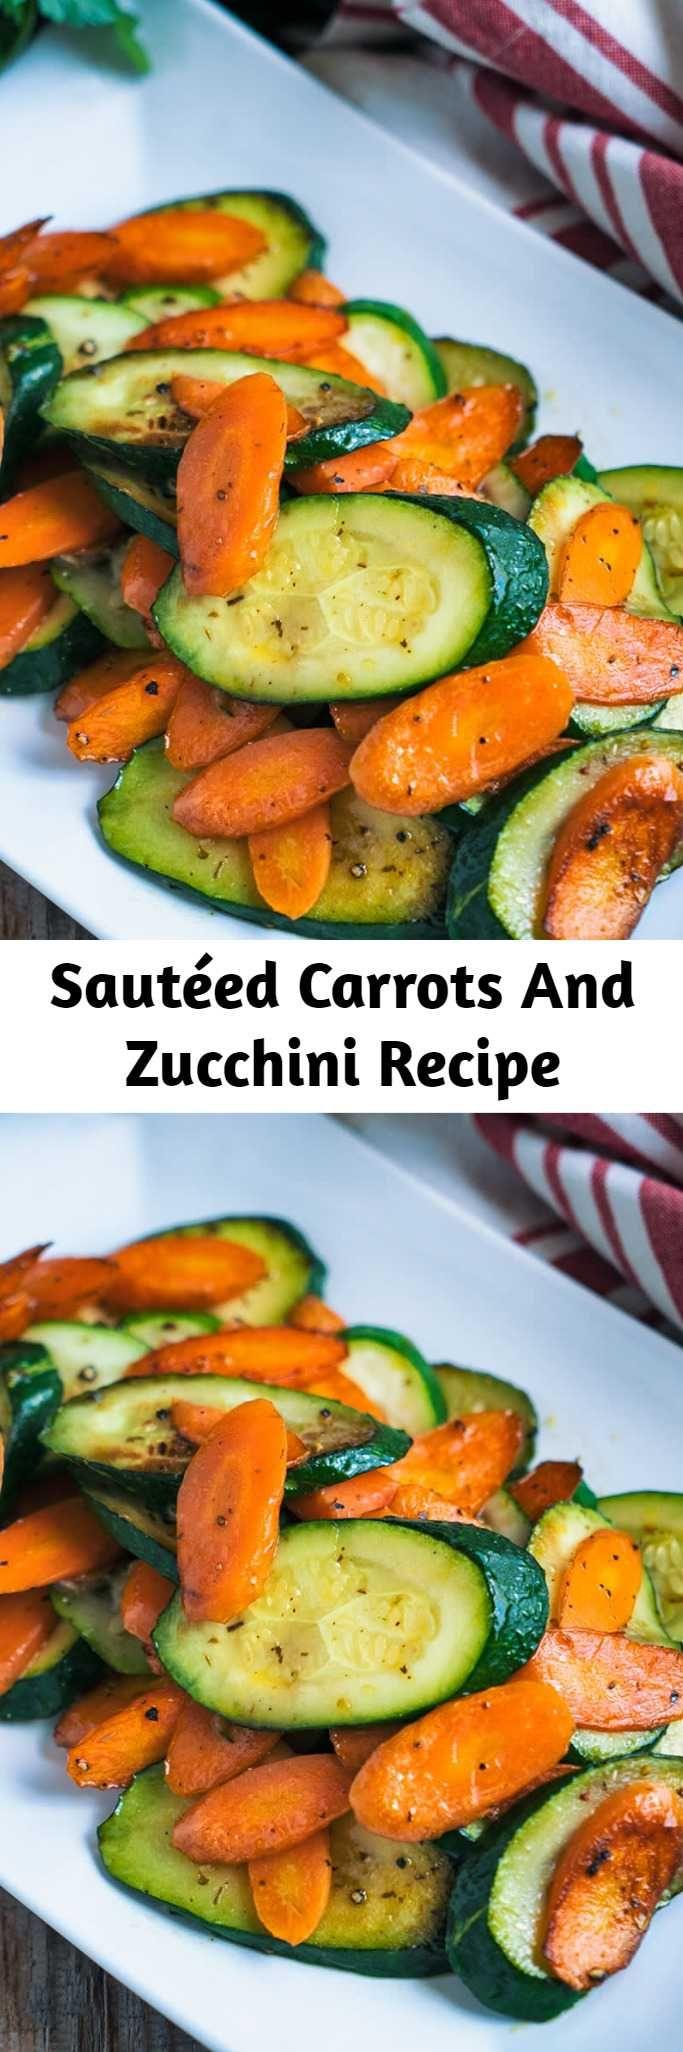 Sautéed Carrots And Zucchini Recipe